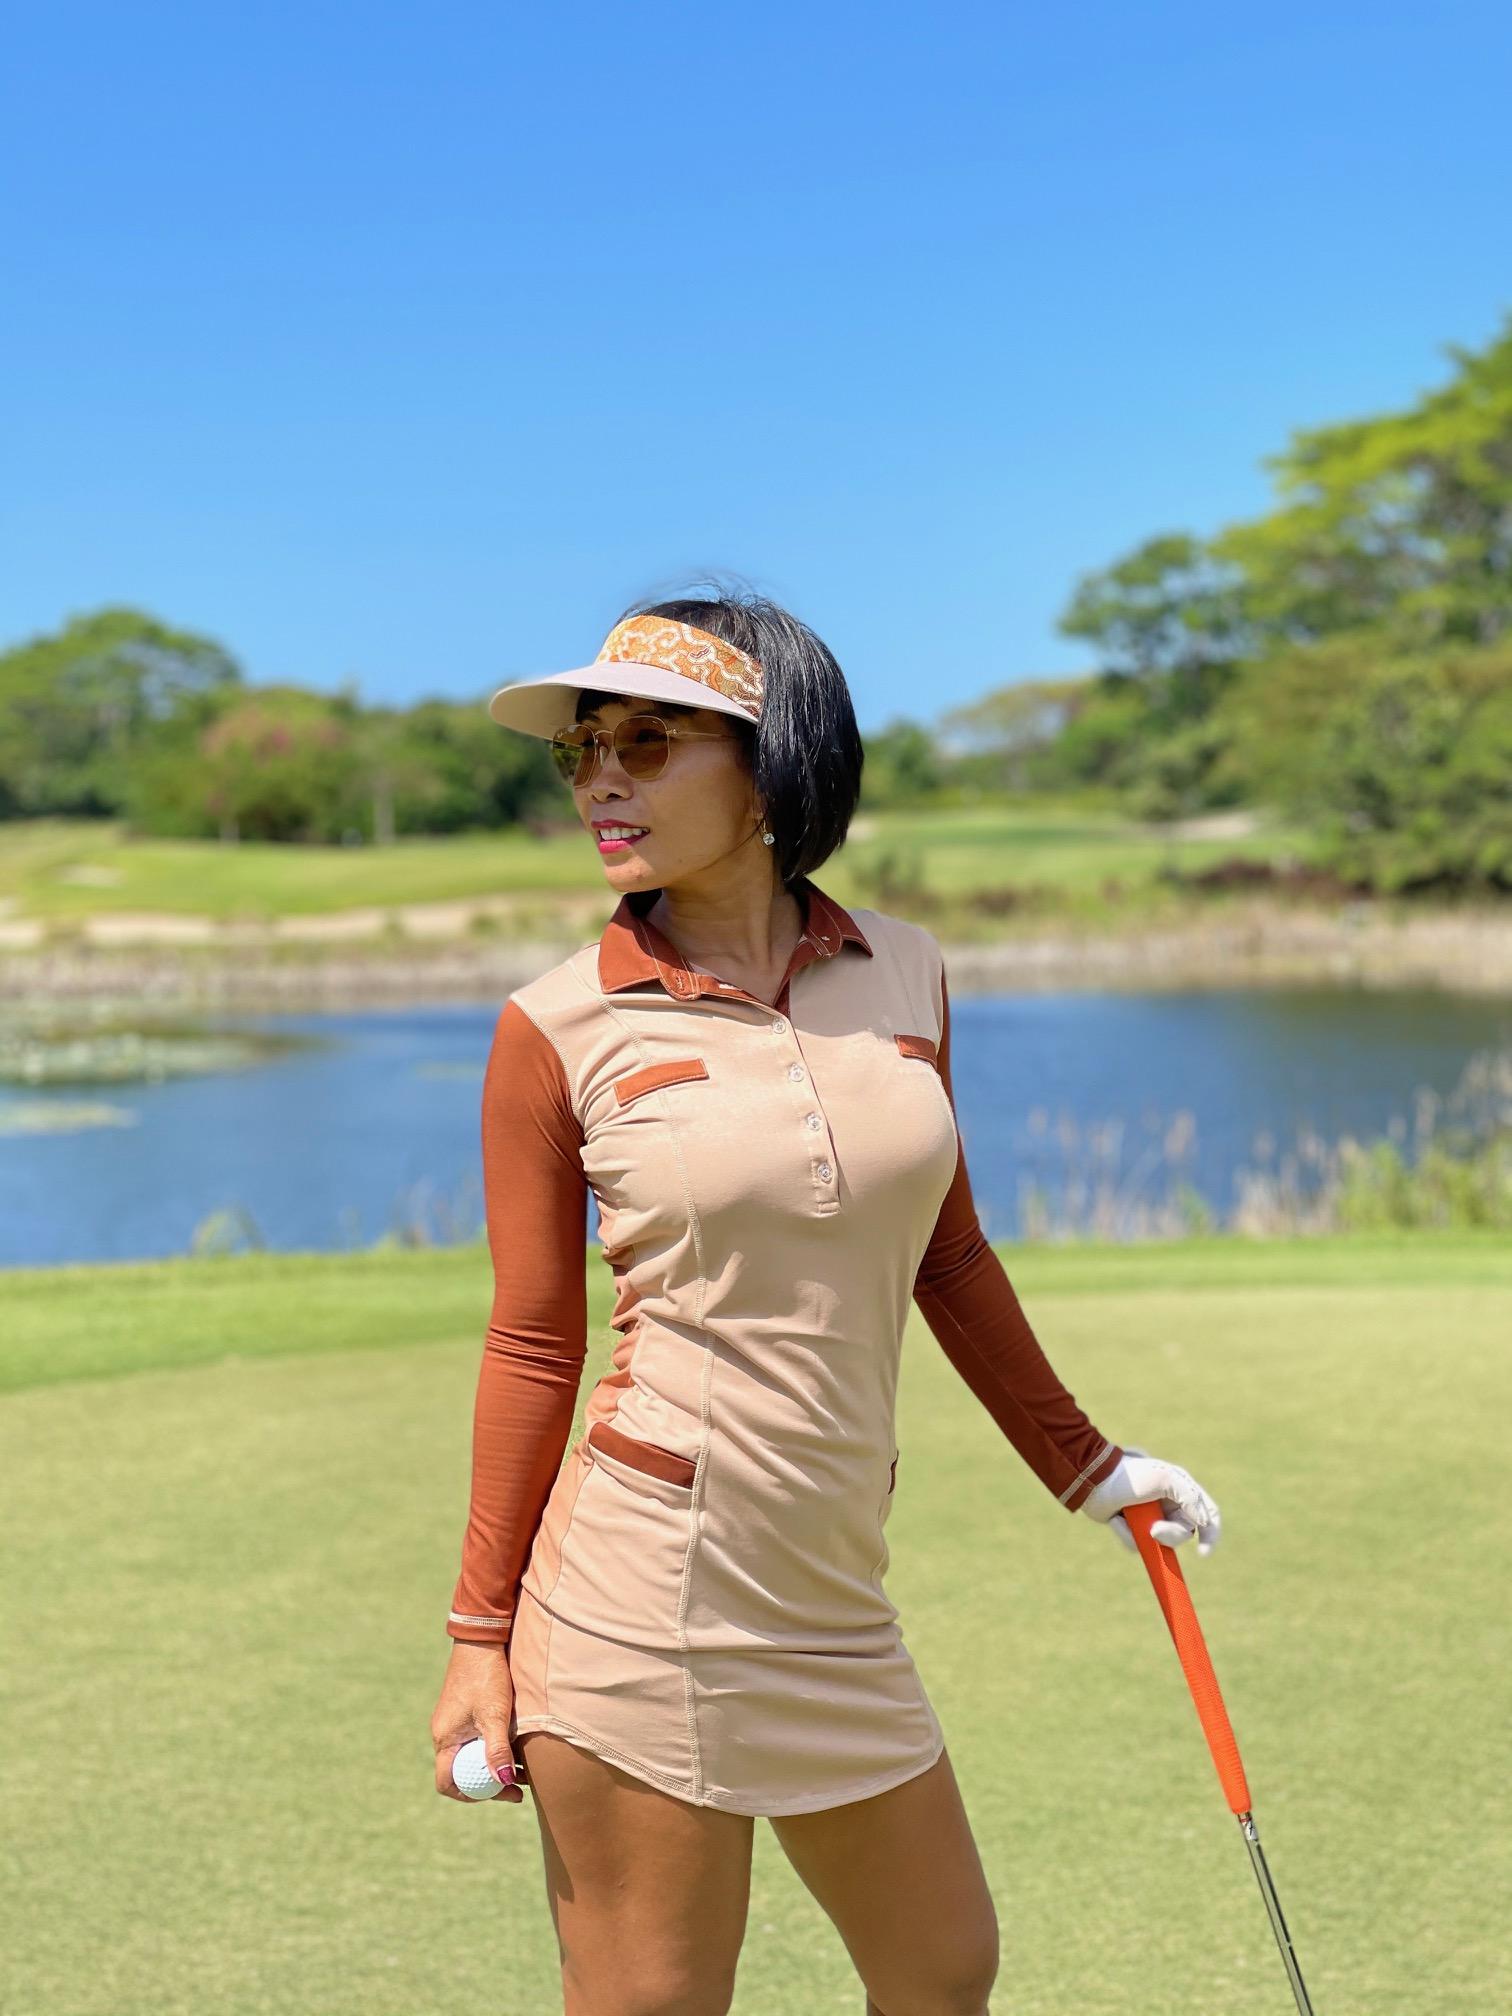 GD-012    Golf Dress Fawn With Dark Brown 2 Tone Front  LS 2 Reverse Tone Rear Mock Breast Pocket Trims W 2 Waist Pockets